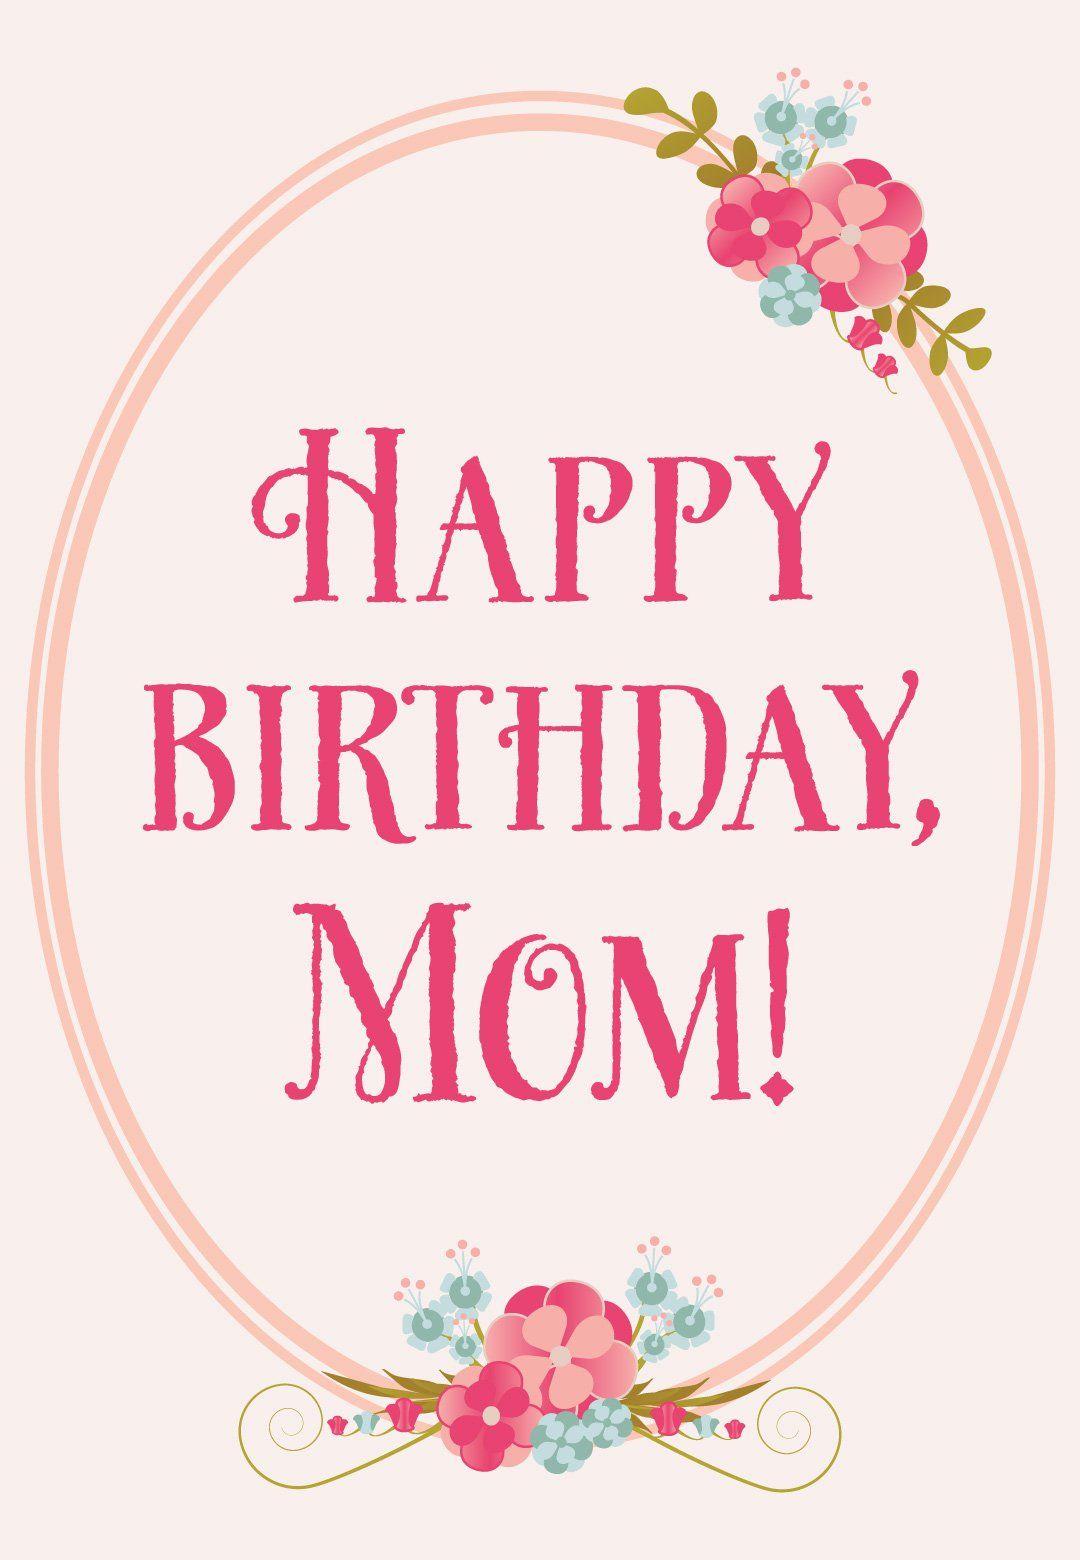 Floral Birthday for Mom Free Printable Birthday Card